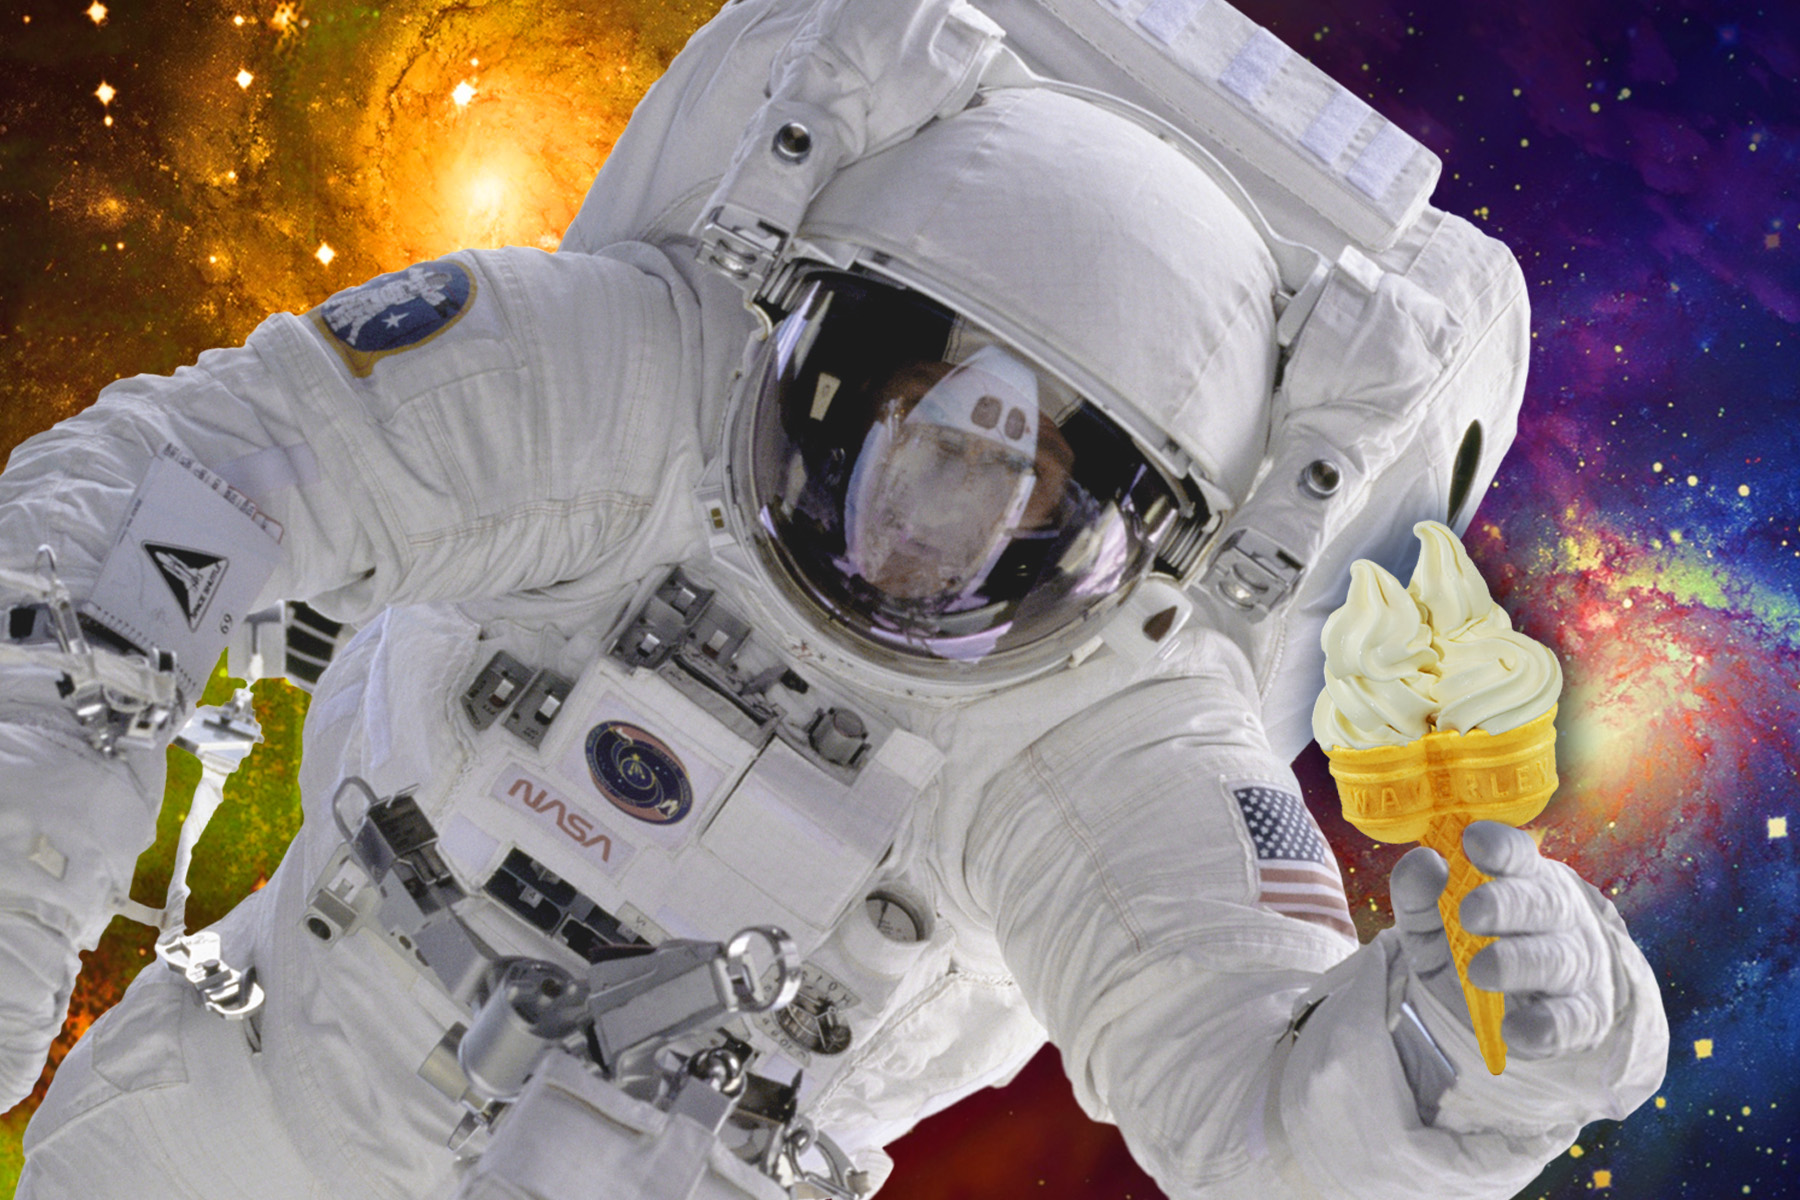 IceCream Astronaut 2